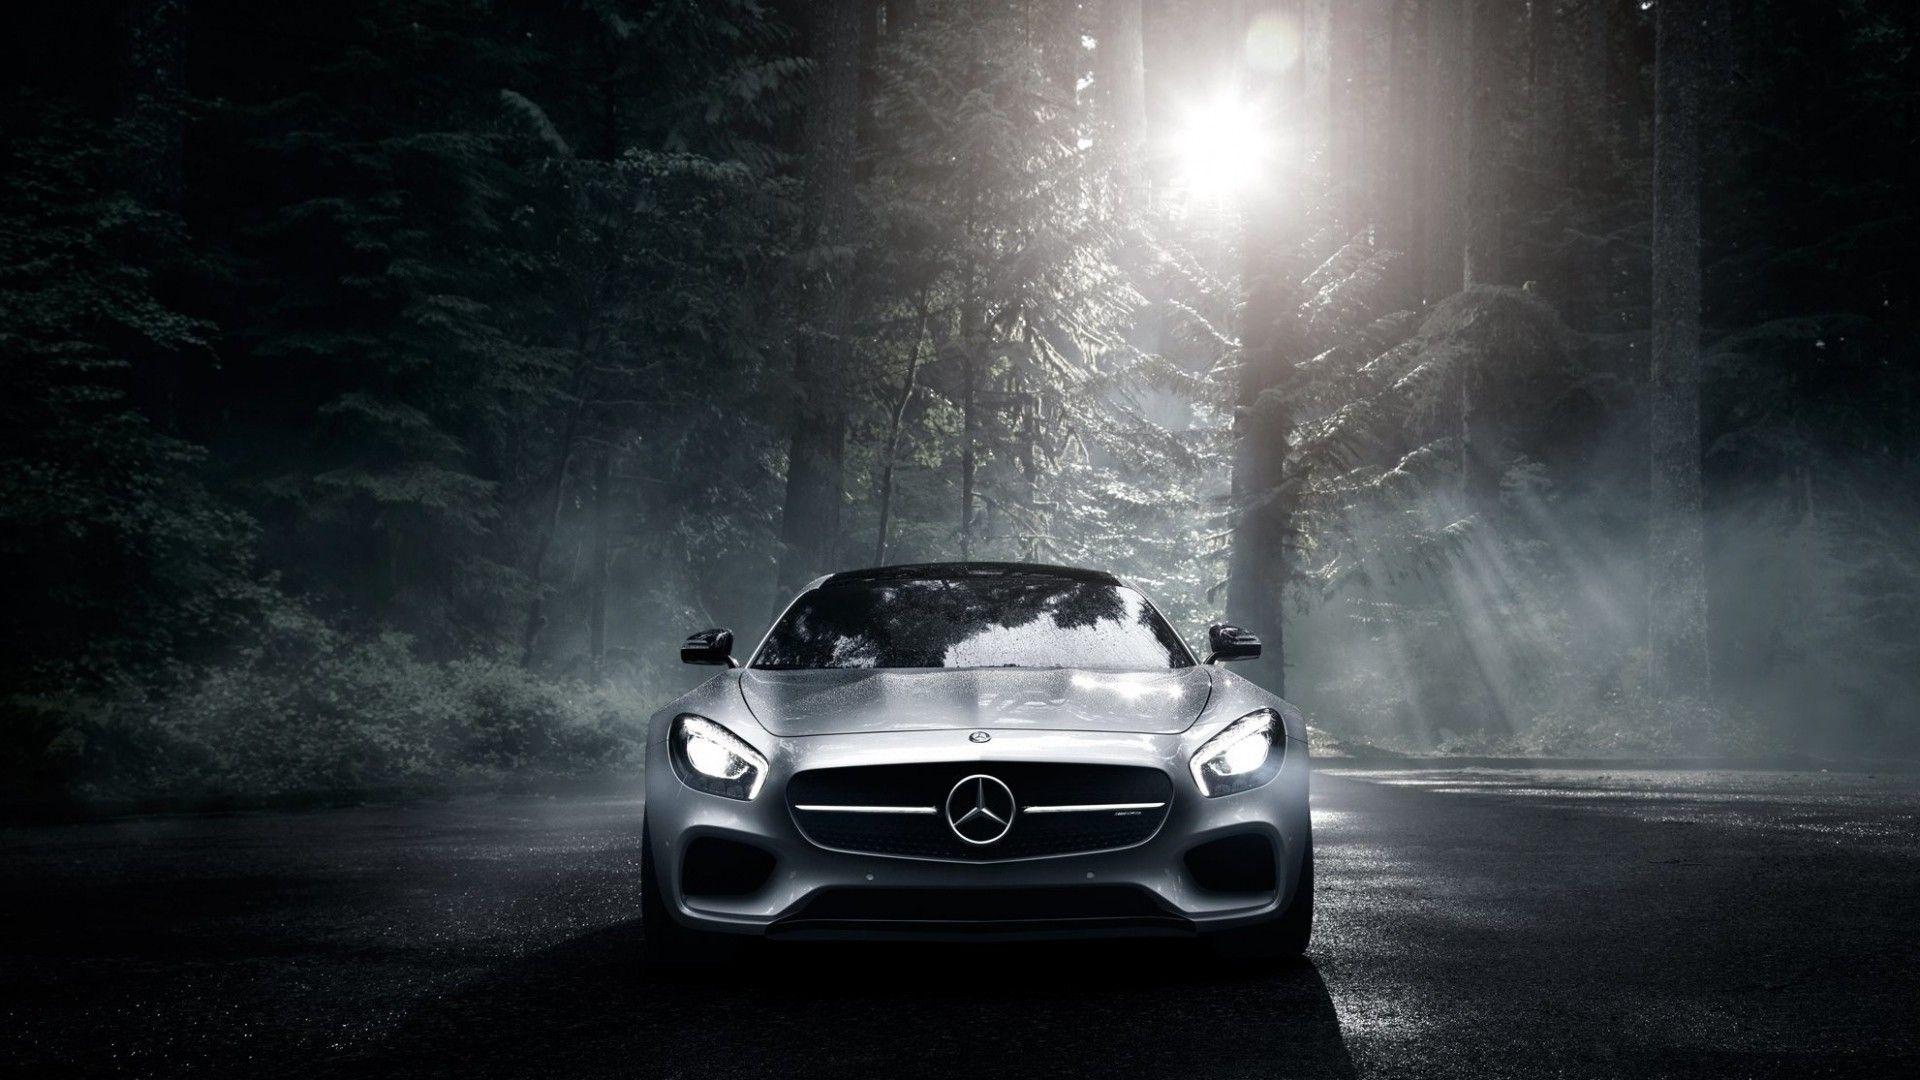 1920x1080 Background Full Hd 1080p 1920x1080 Wallpaper Mercedes